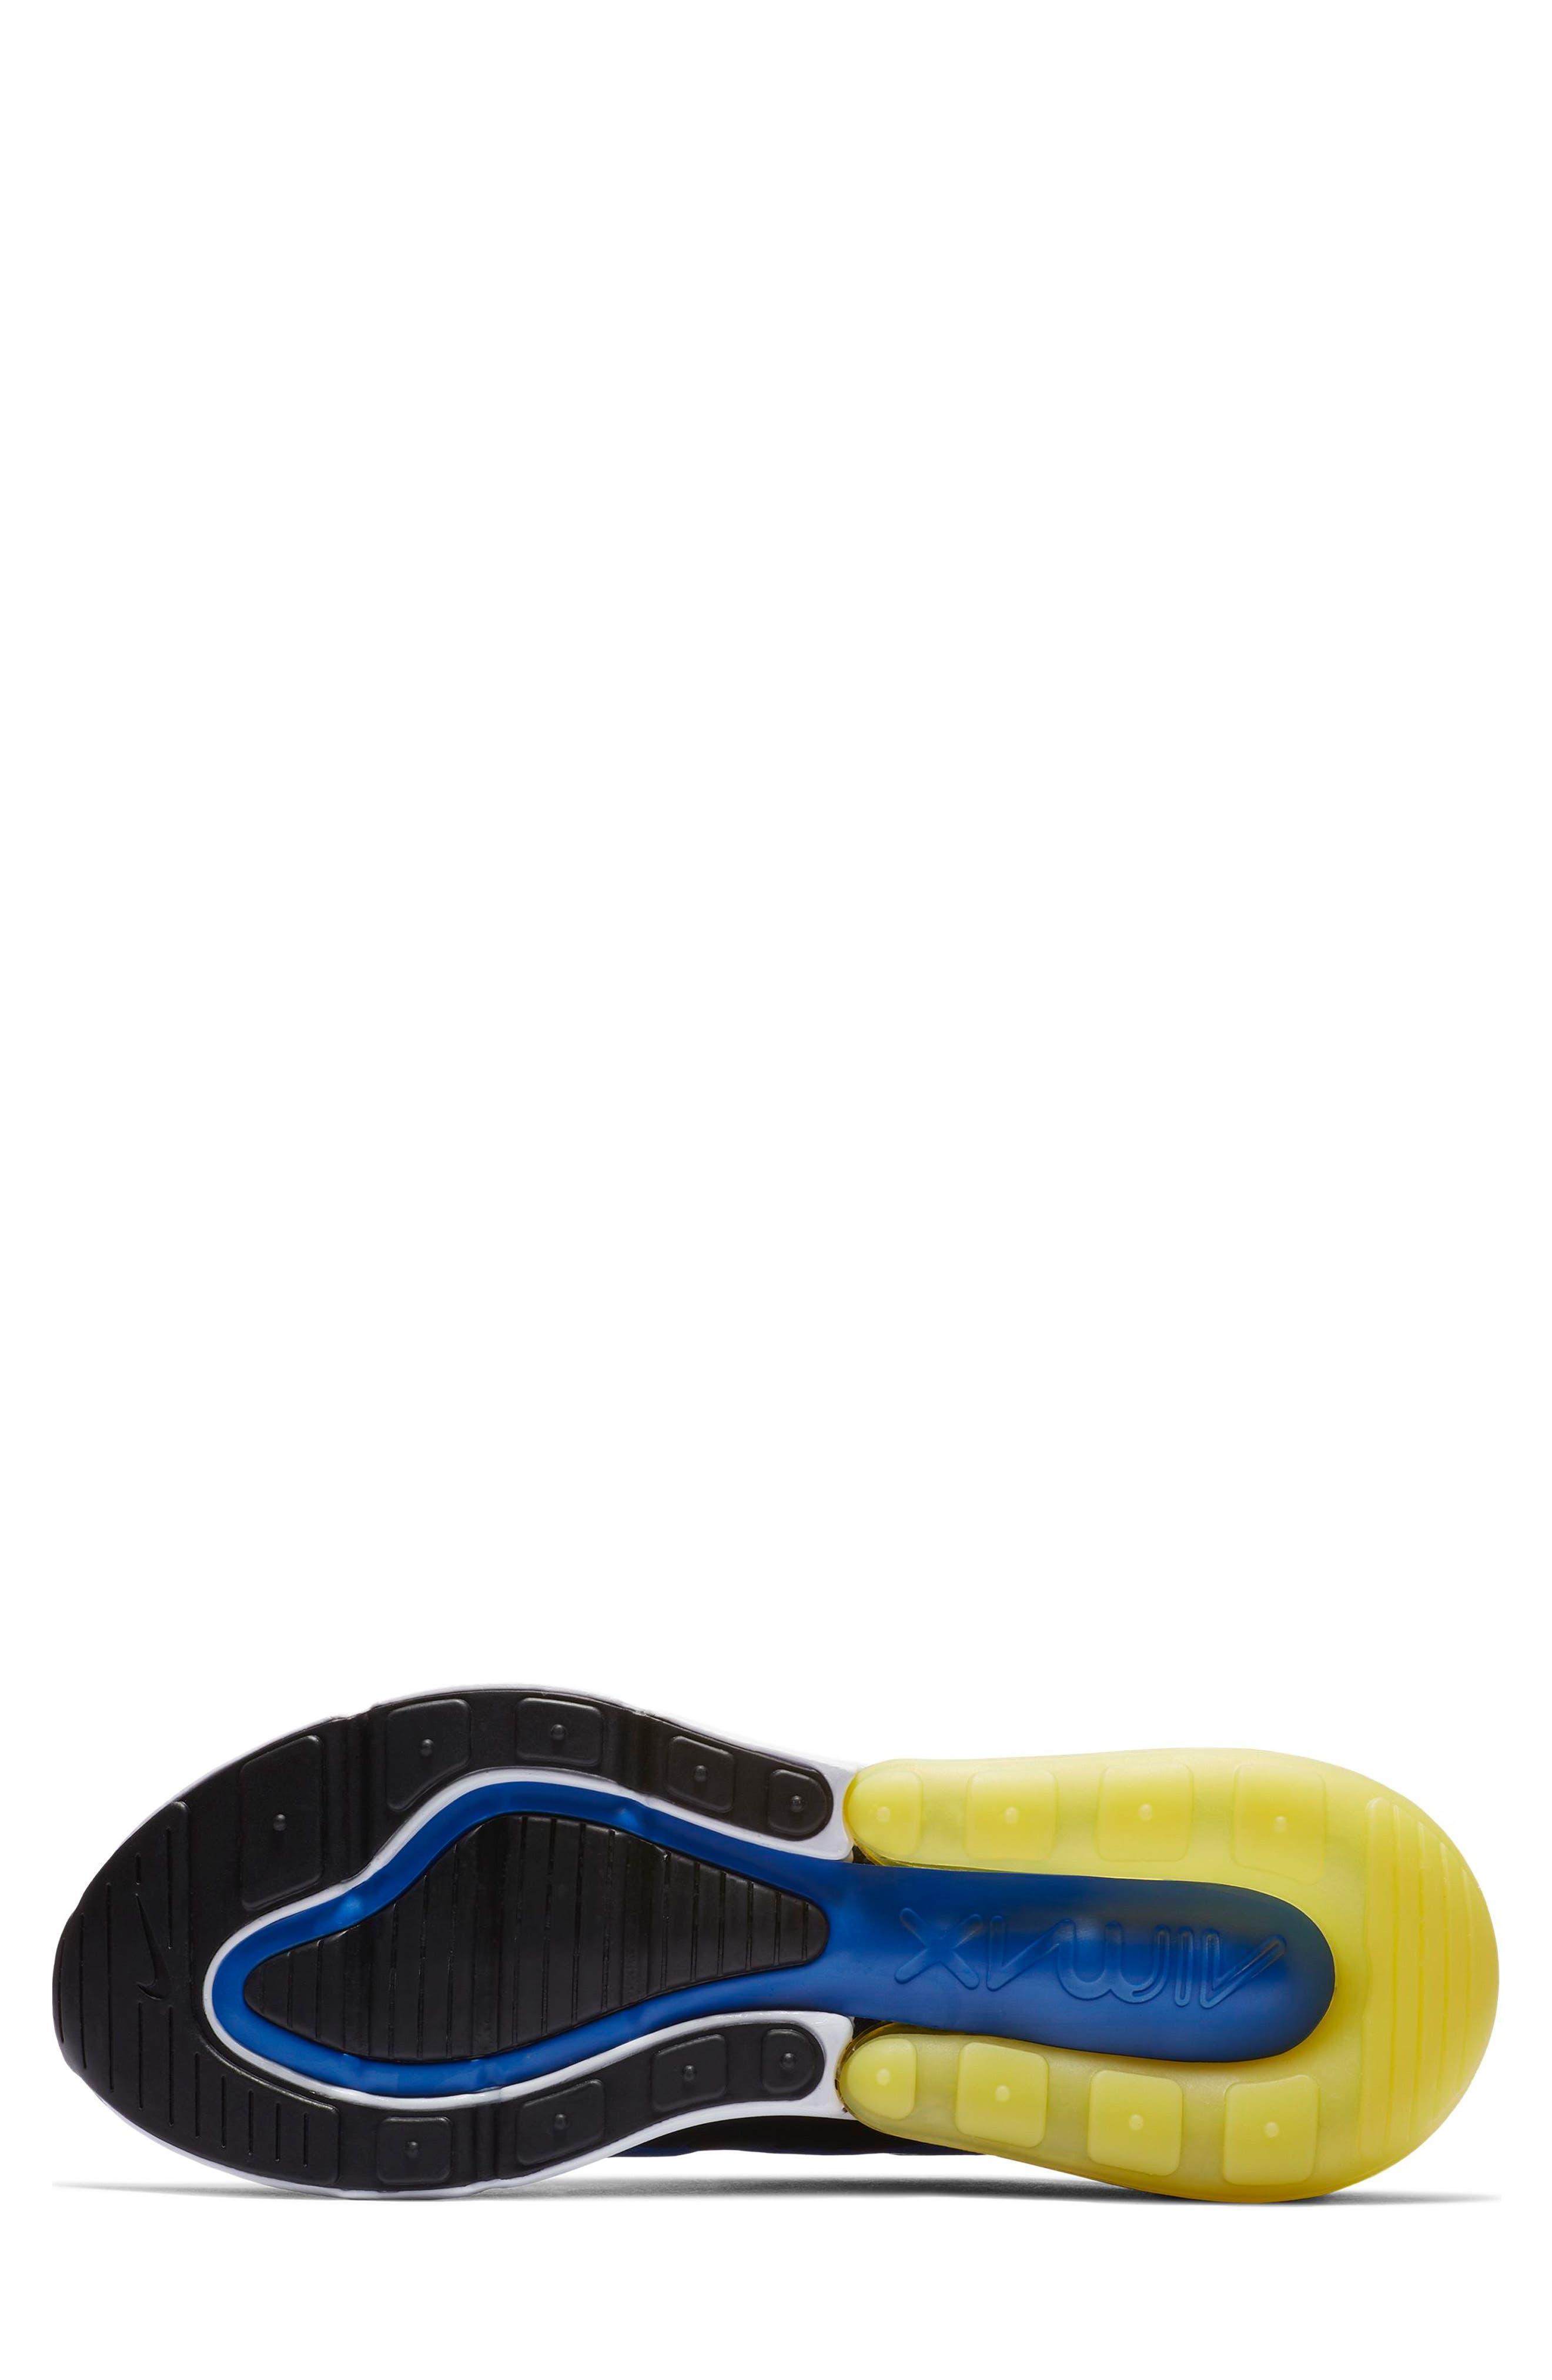 Air Max 270 Sneaker,                             Alternate thumbnail 4, color,                             GAME ROYAL/ WHITE/ BLACK